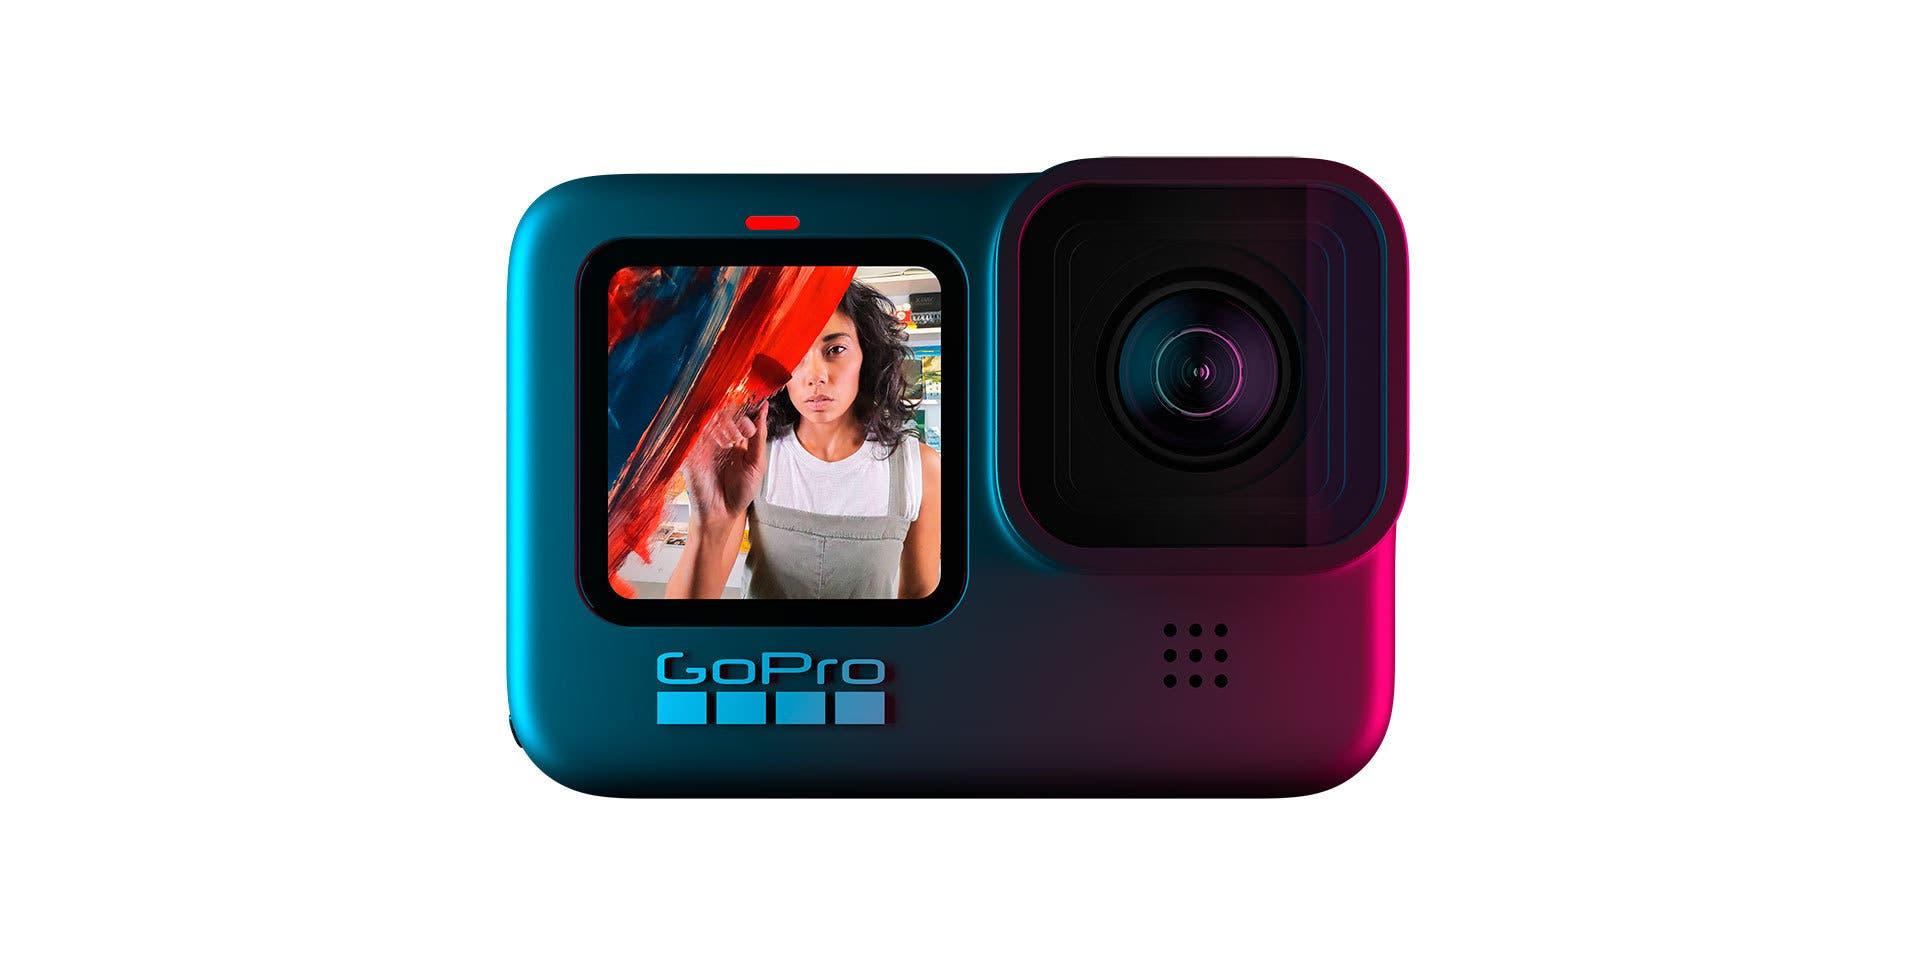 Pretul camerei GoPro Hero 9 Black care filmeaza 5K